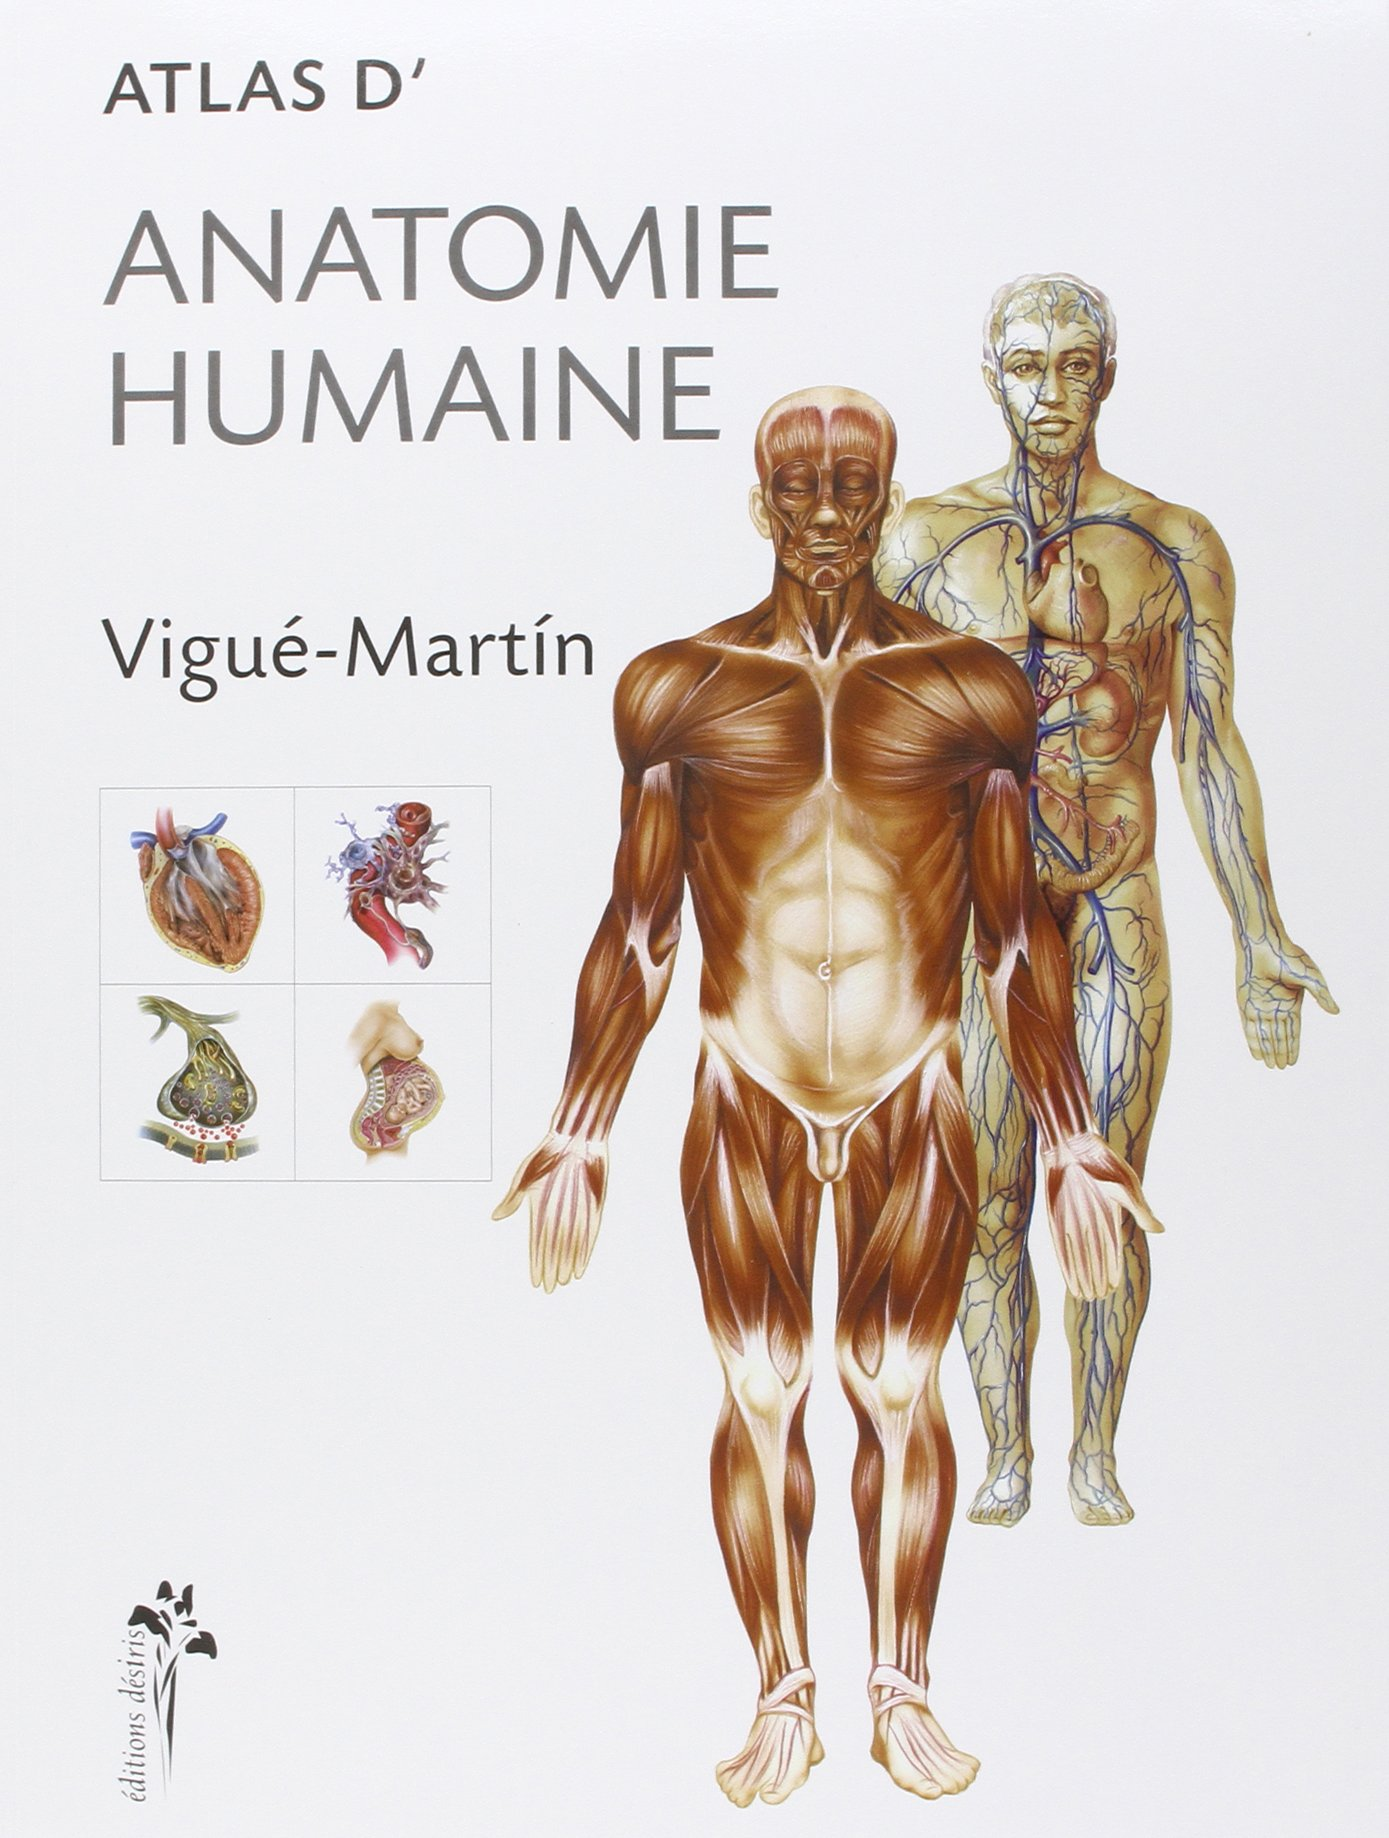 Atlas d'anatomie humaine Broché – 22 juillet 2004 Vigué-Martin Atlas d' anatomie humaine ADVERBUM 2907653946